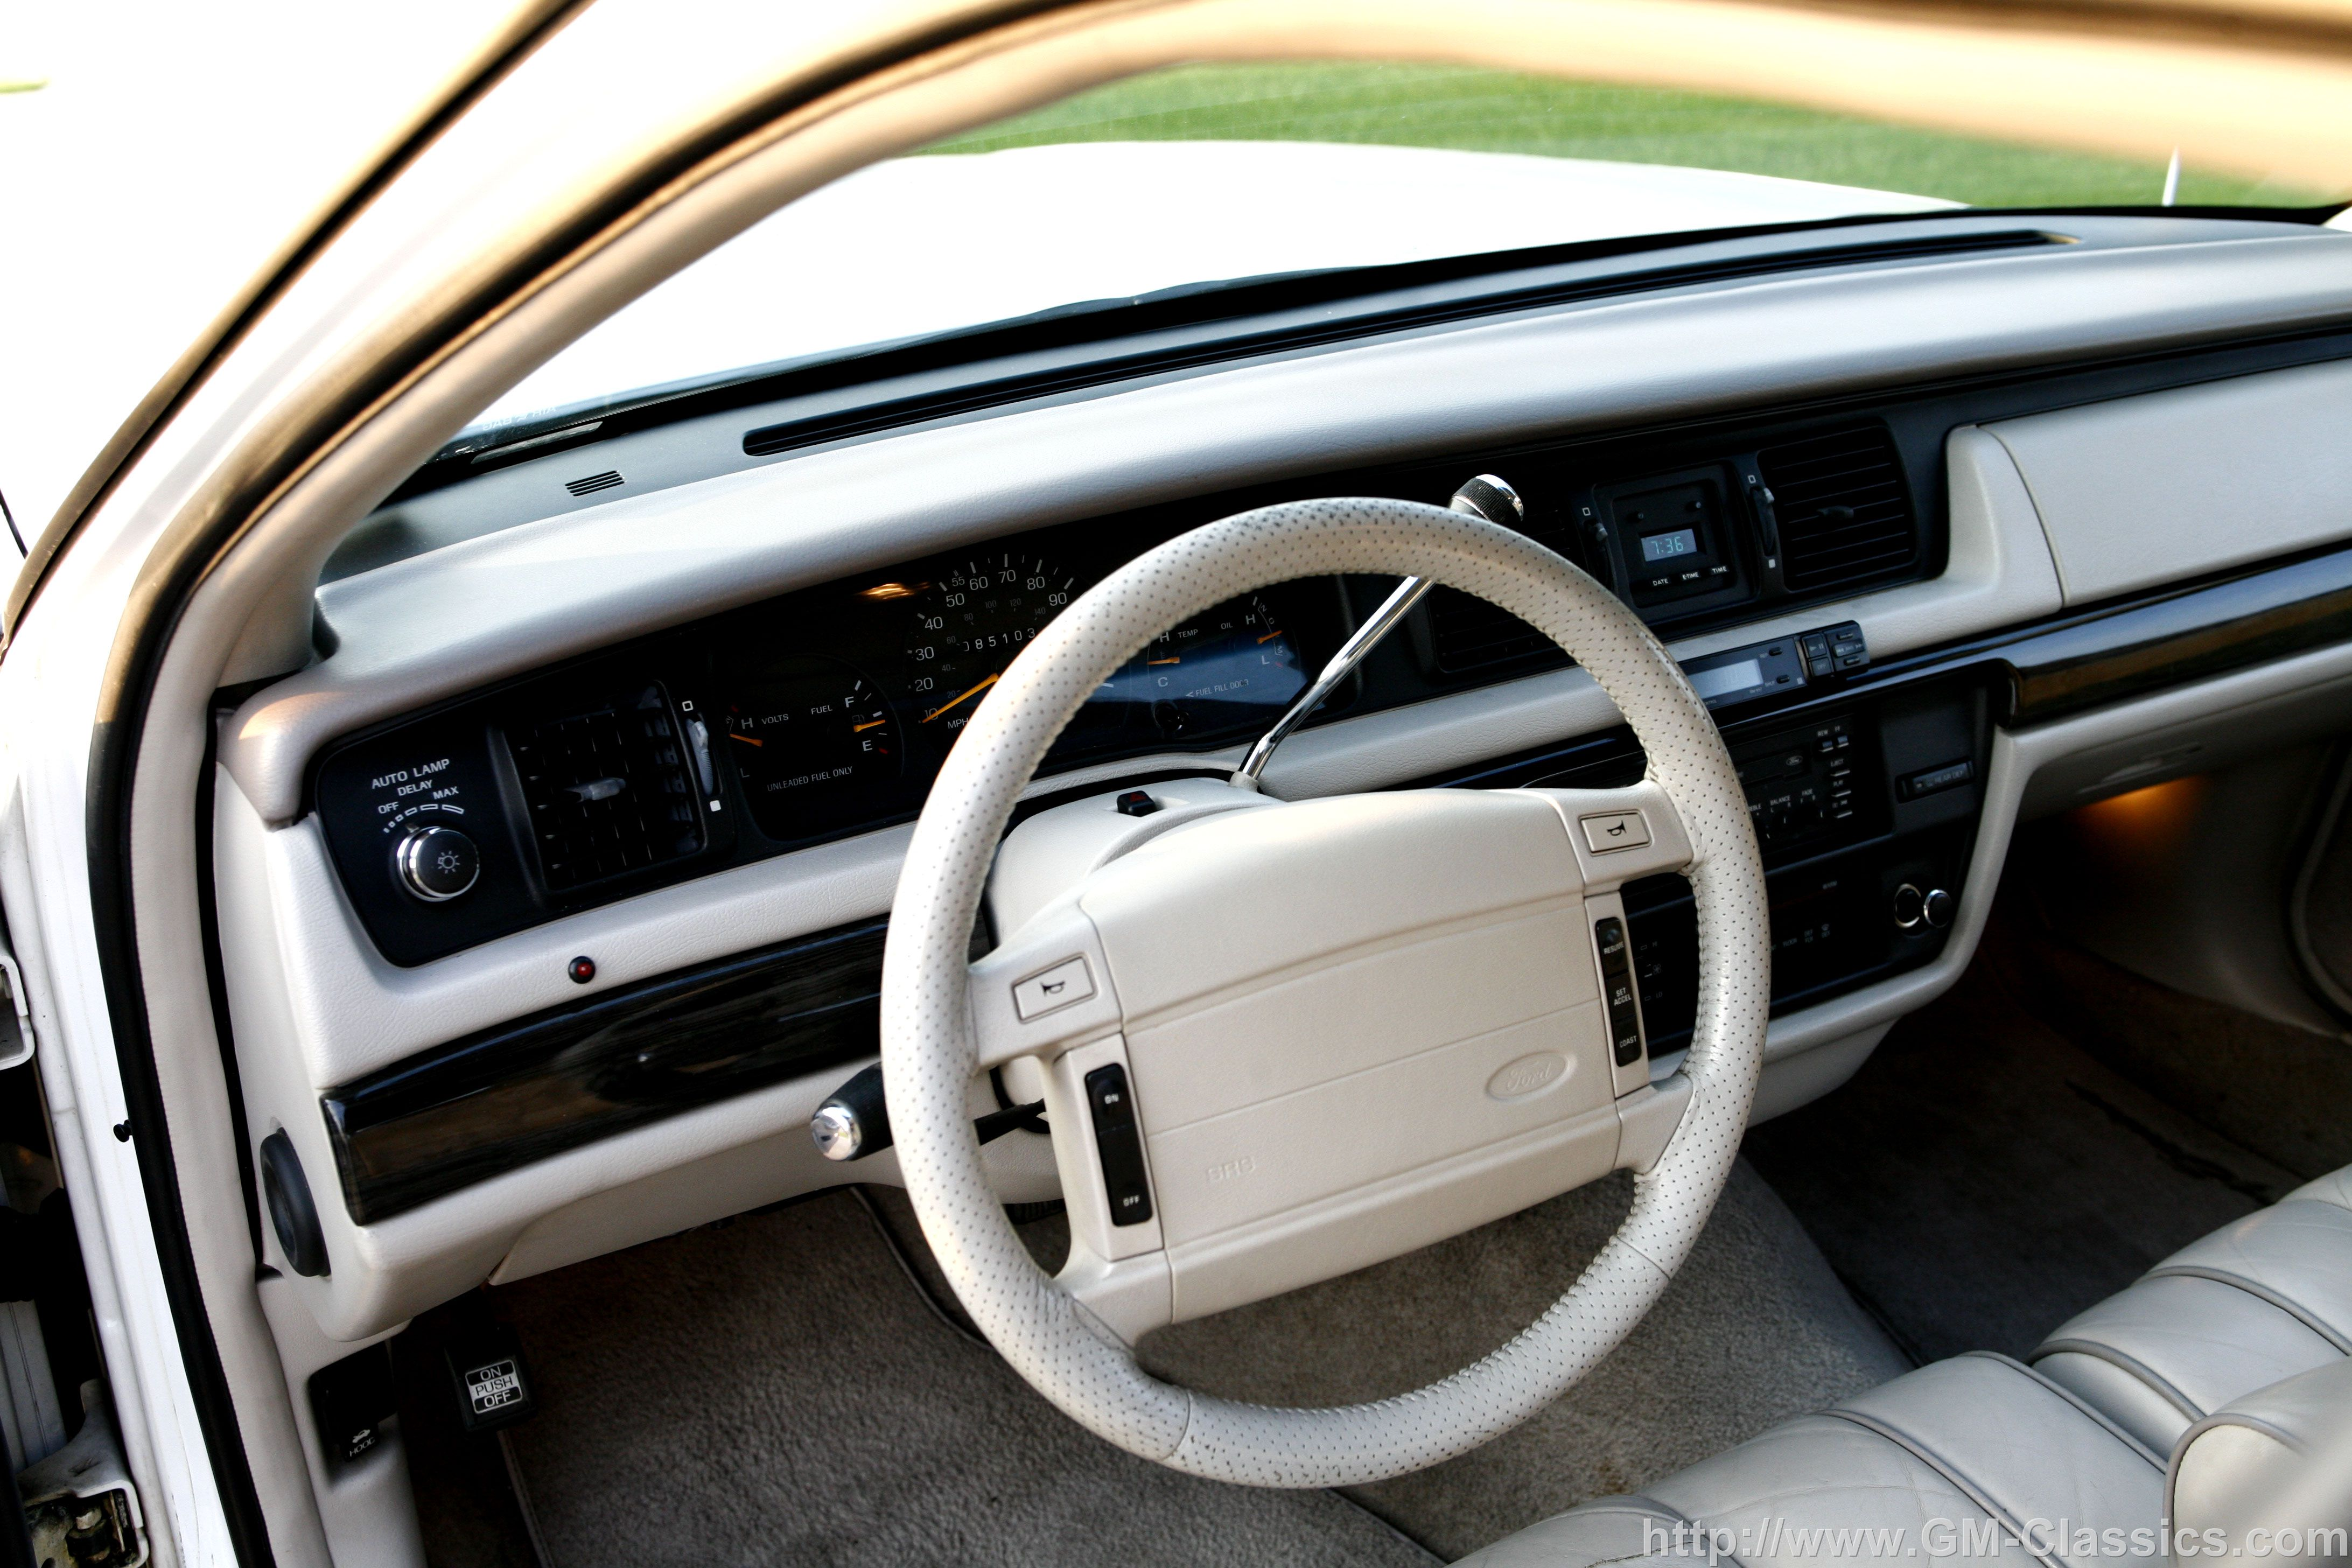 1992 Crown Victoria Touring Sedan P75